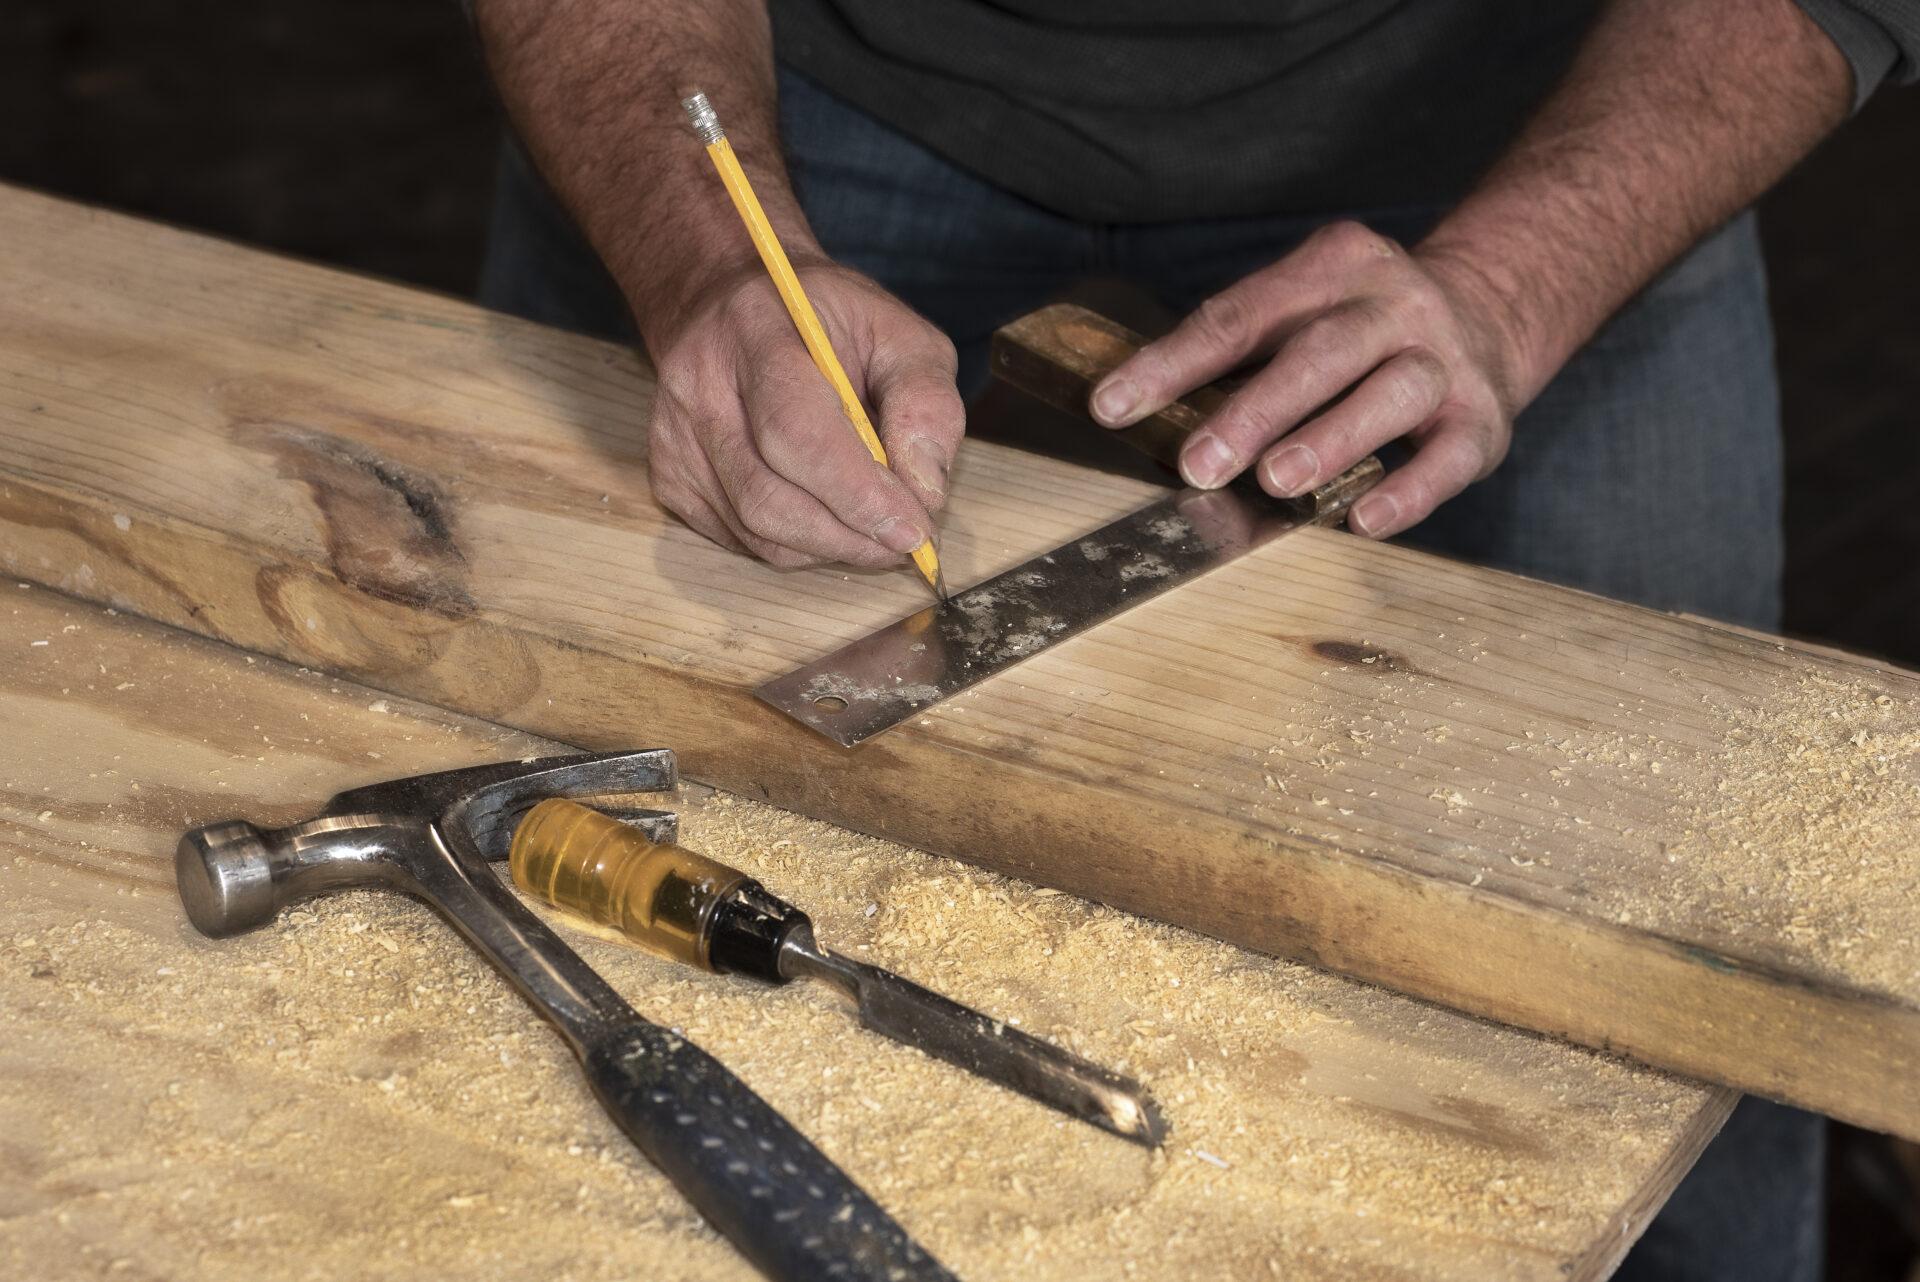 Carpenter marking measurements during renovation of fixer-upper